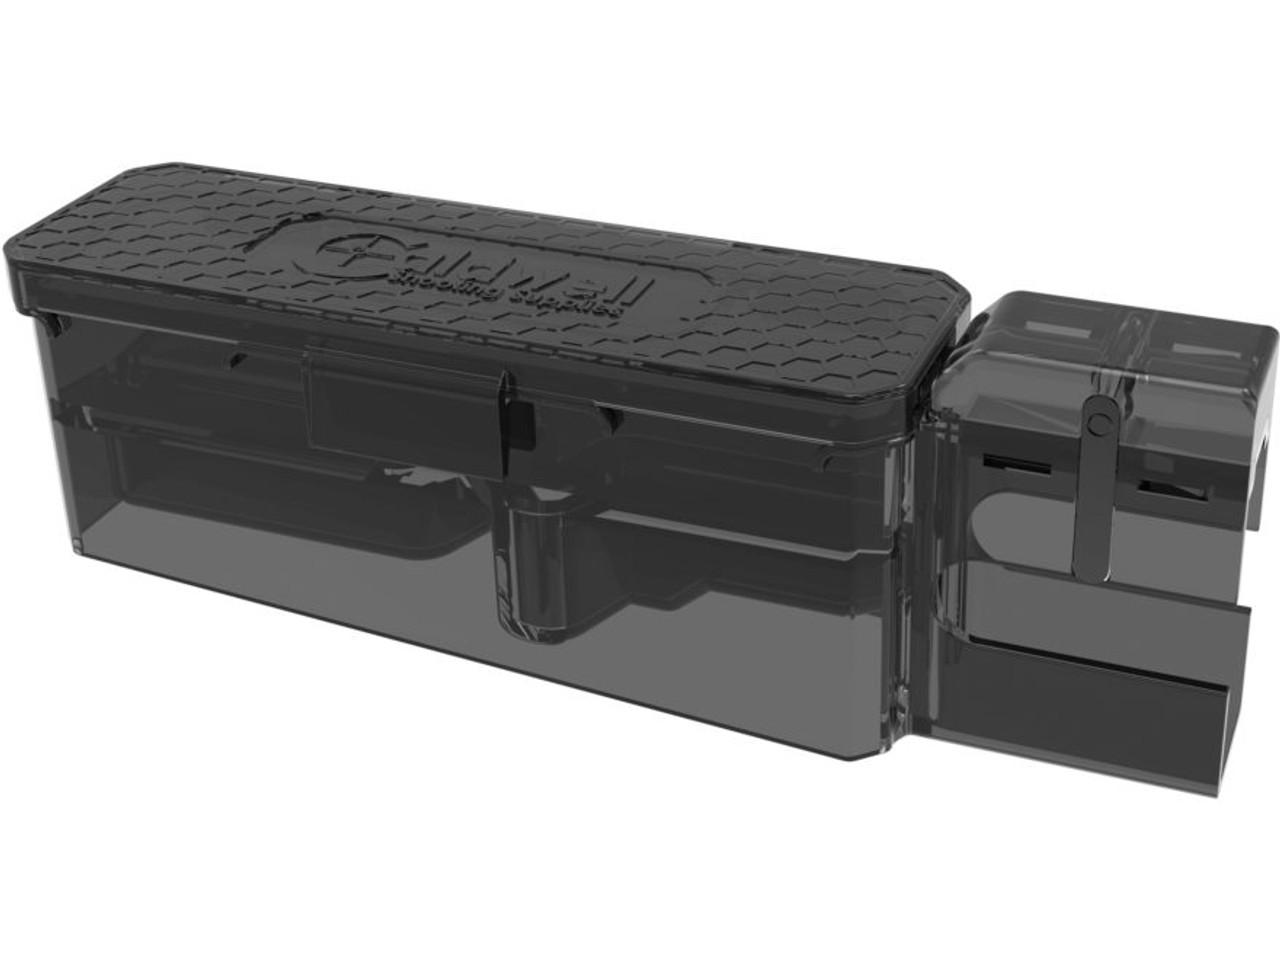 Caldwell Mag Charger Rimfire AR-15 22 Magazine Loader